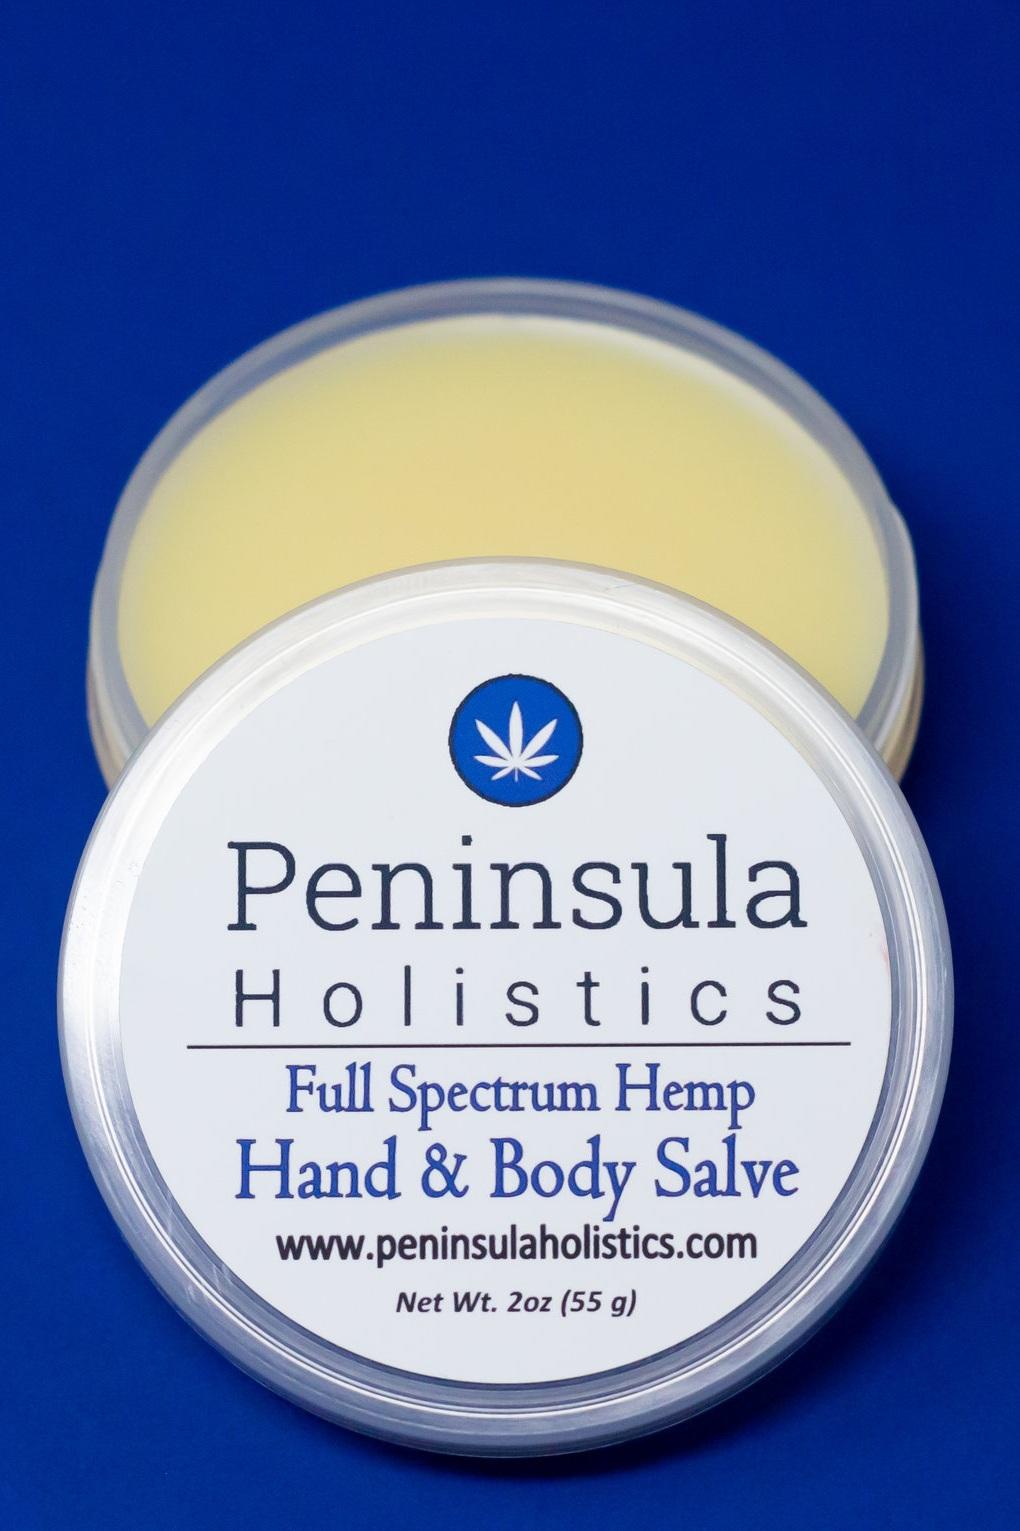 Peninsula Holistics Full Spectrum Hemp  Hand & Body Salve